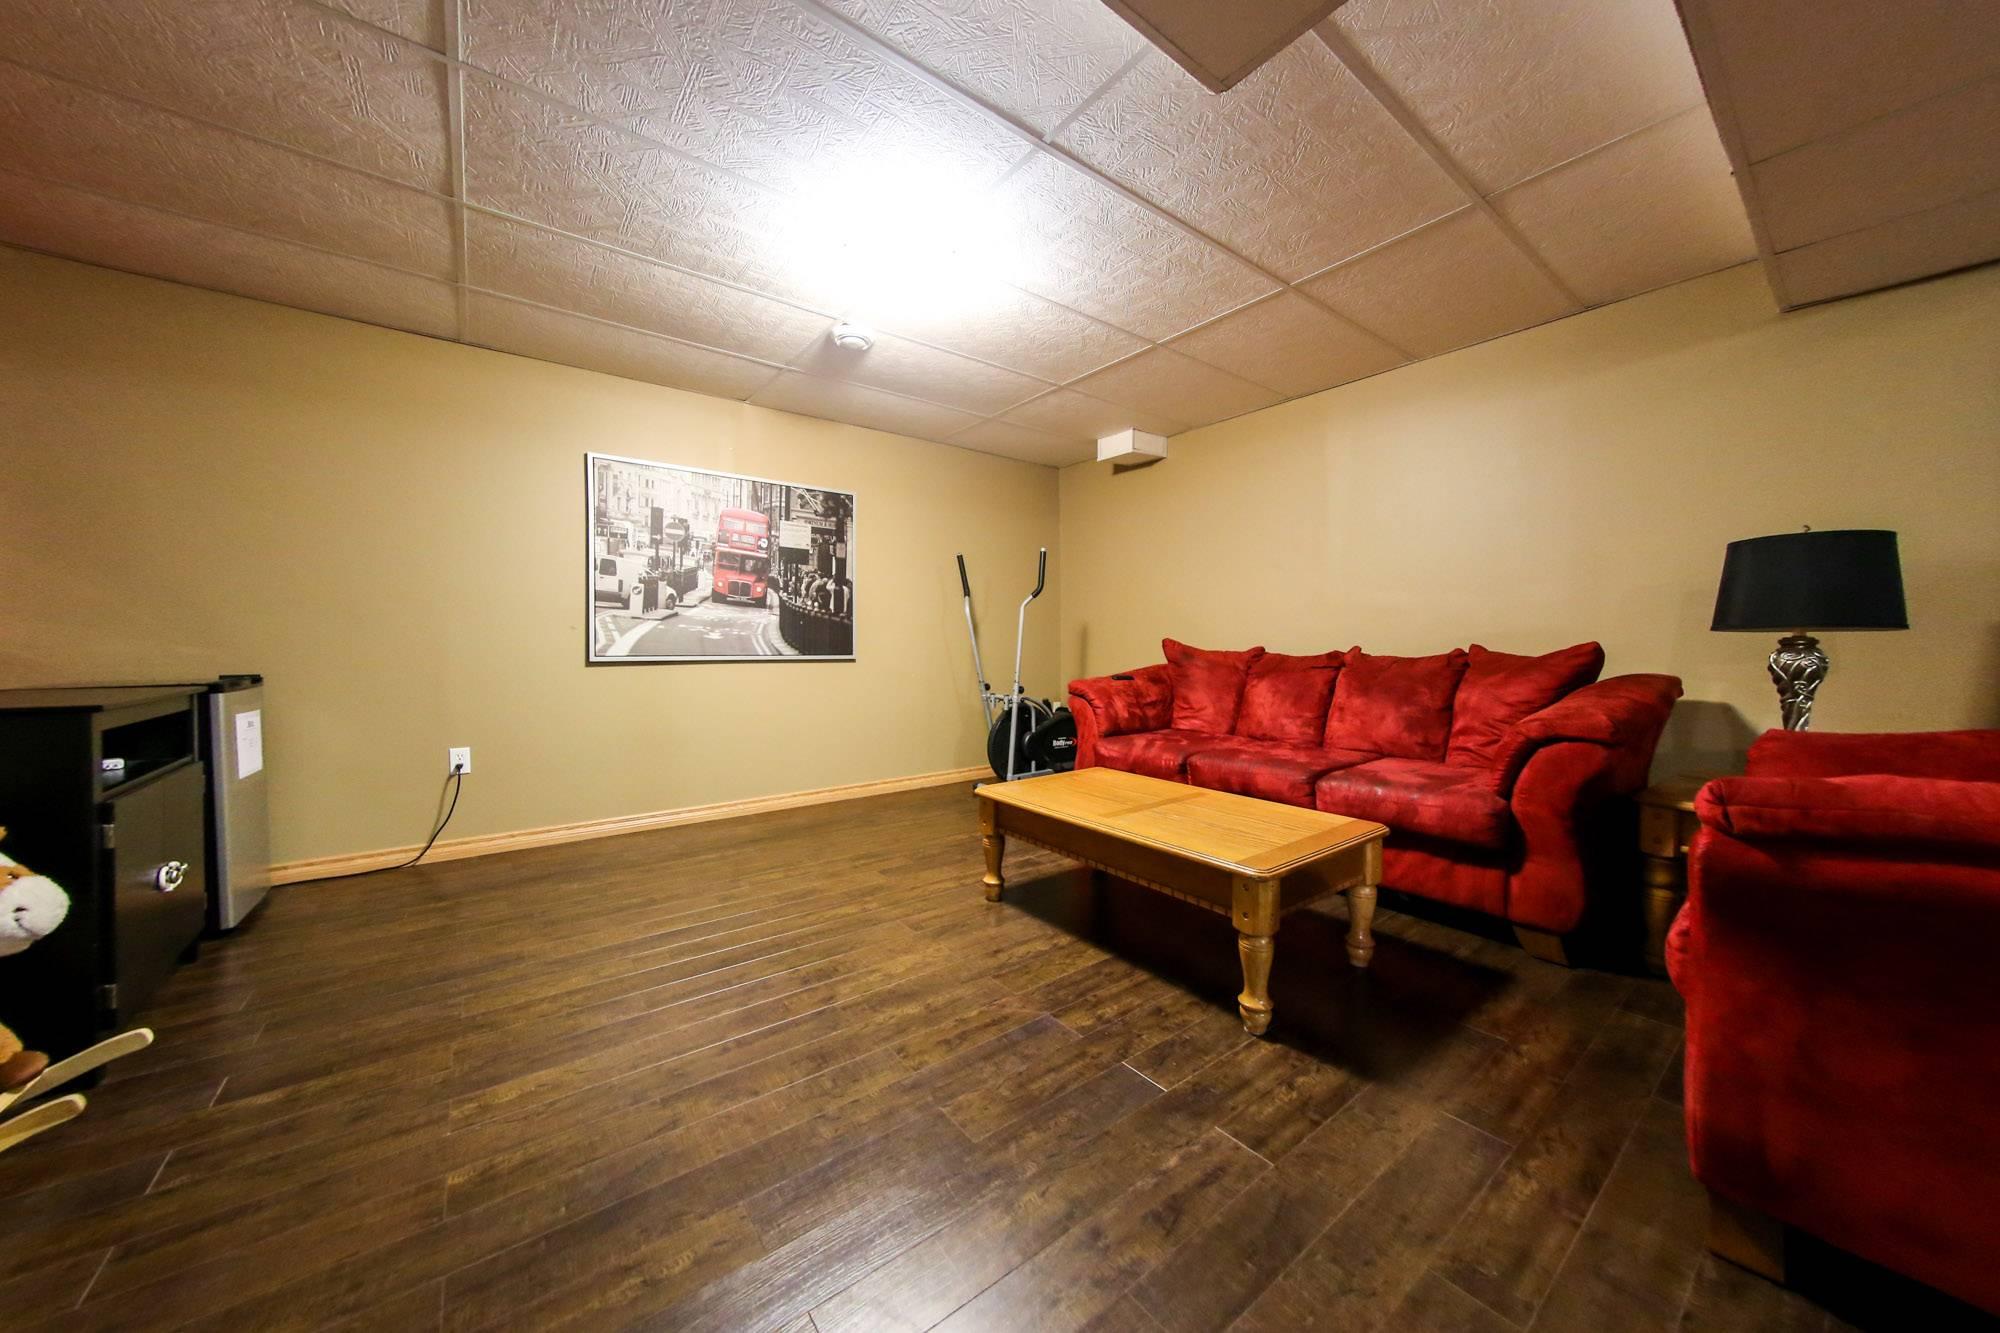 856 Kernaghan Avenue, Winnipeg, Manitoba  R2C 4Z5 - Photo 21 - 1905124